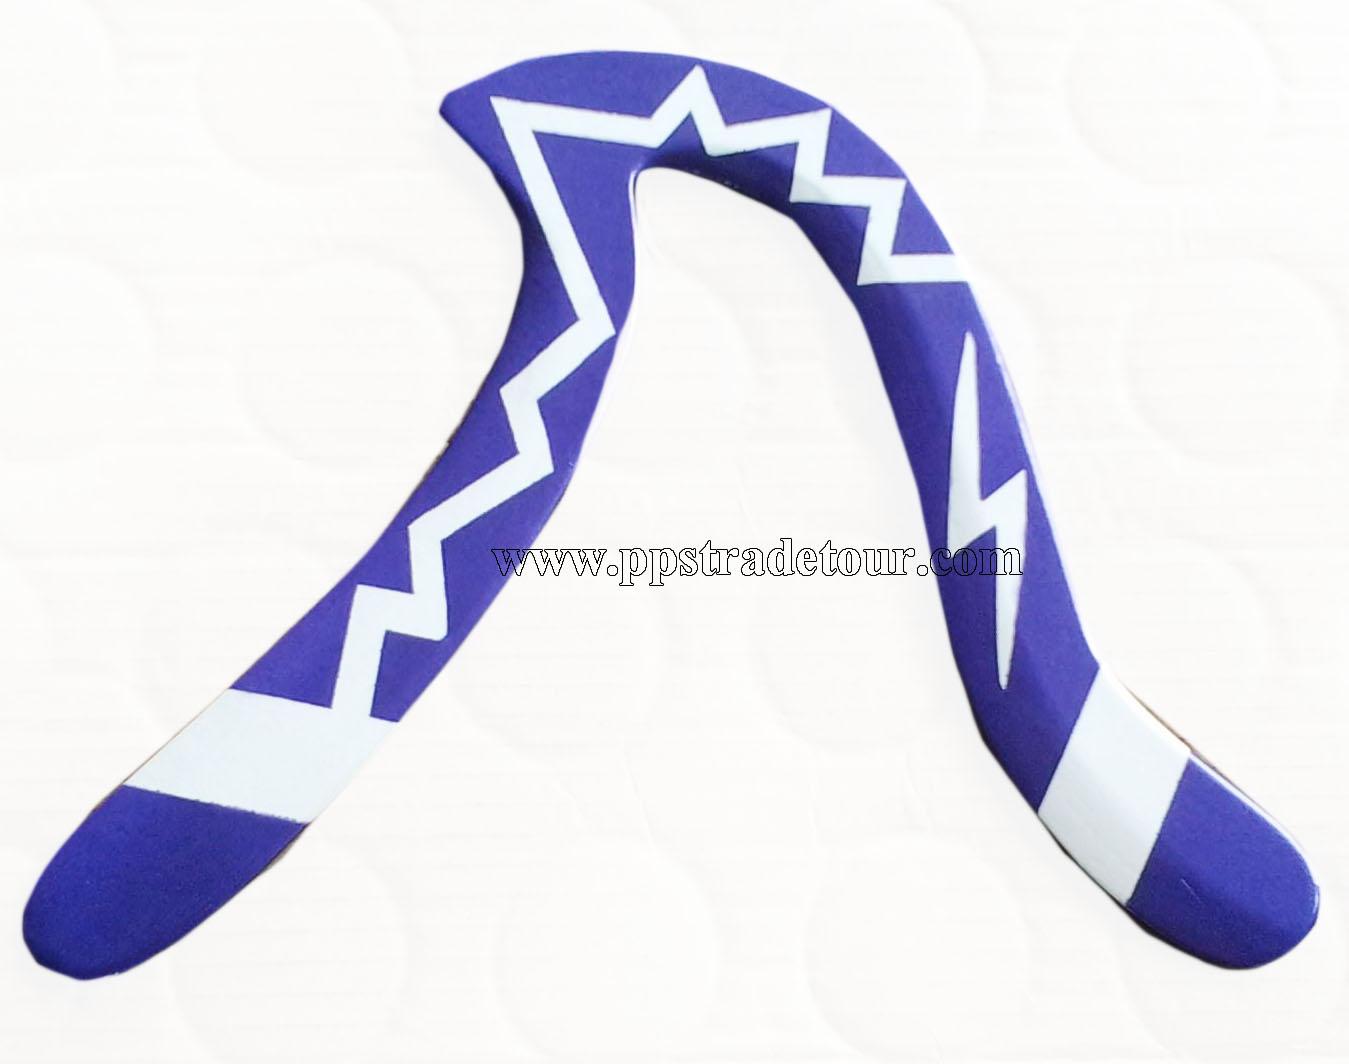 Boomerang-PMN-Kor010-11